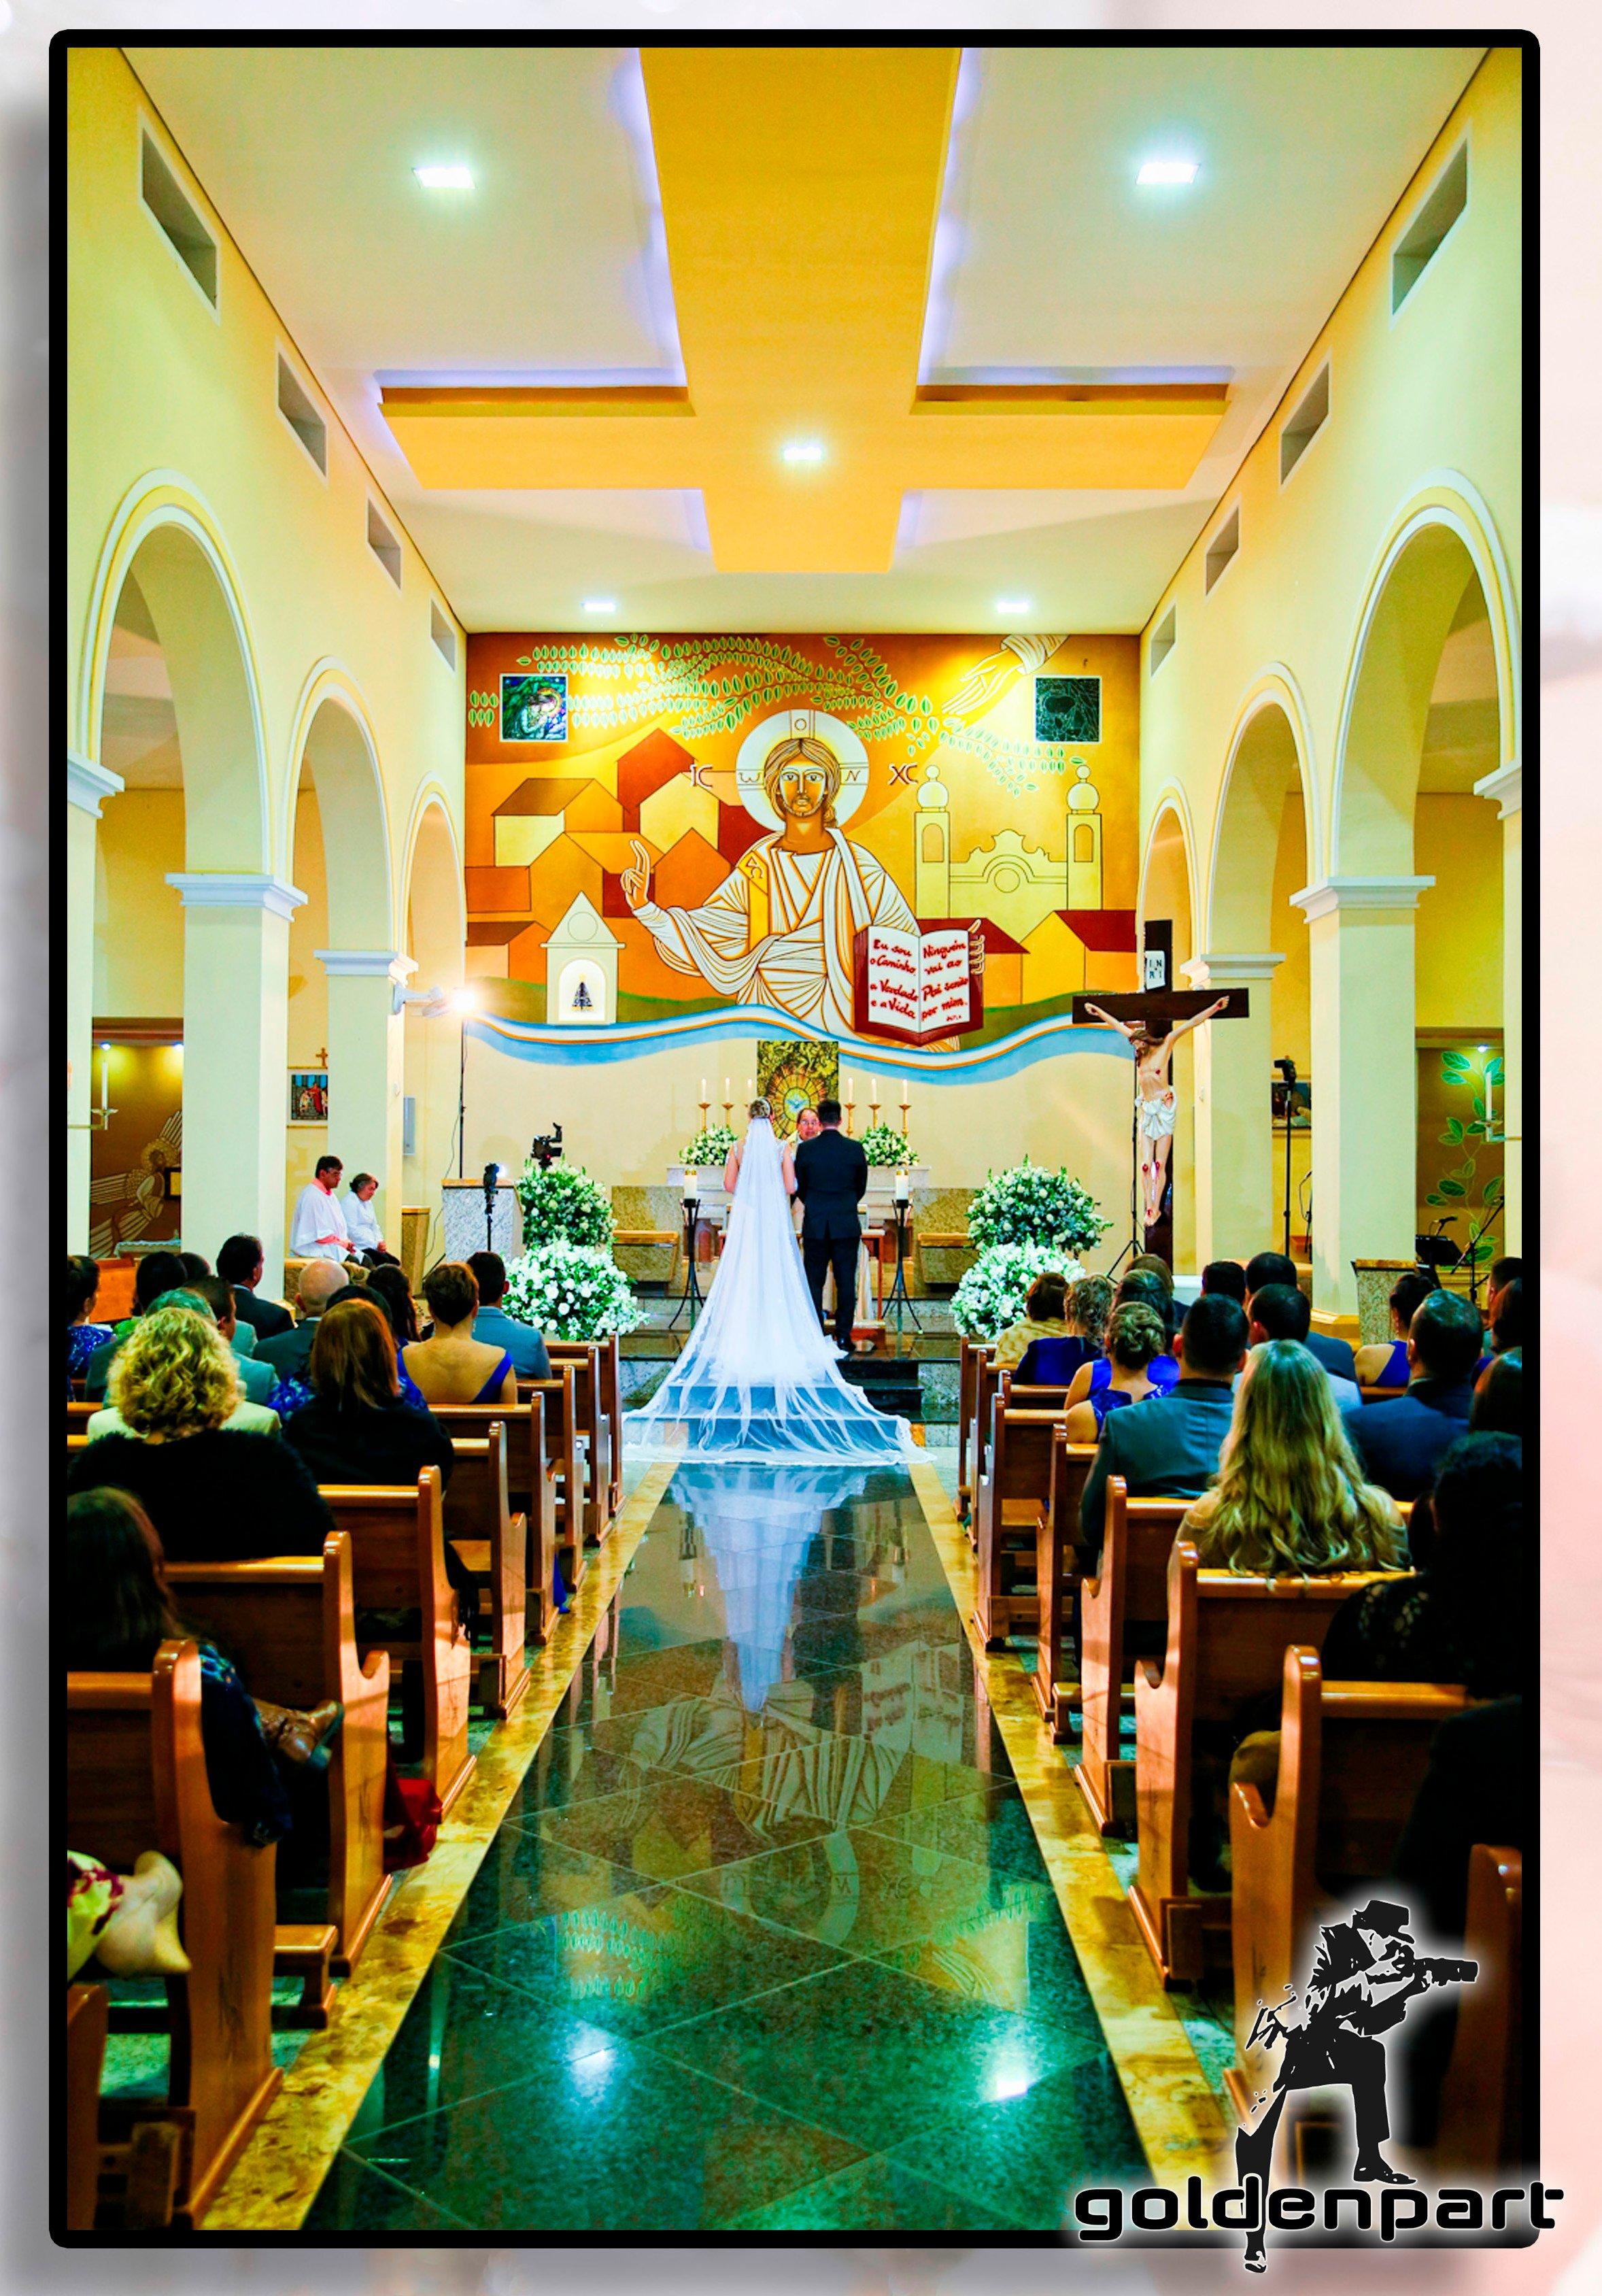 https://0201.nccdn.net/1_2/000/000/0cc/cde/publicidade-igreja-ilicinia.jpg